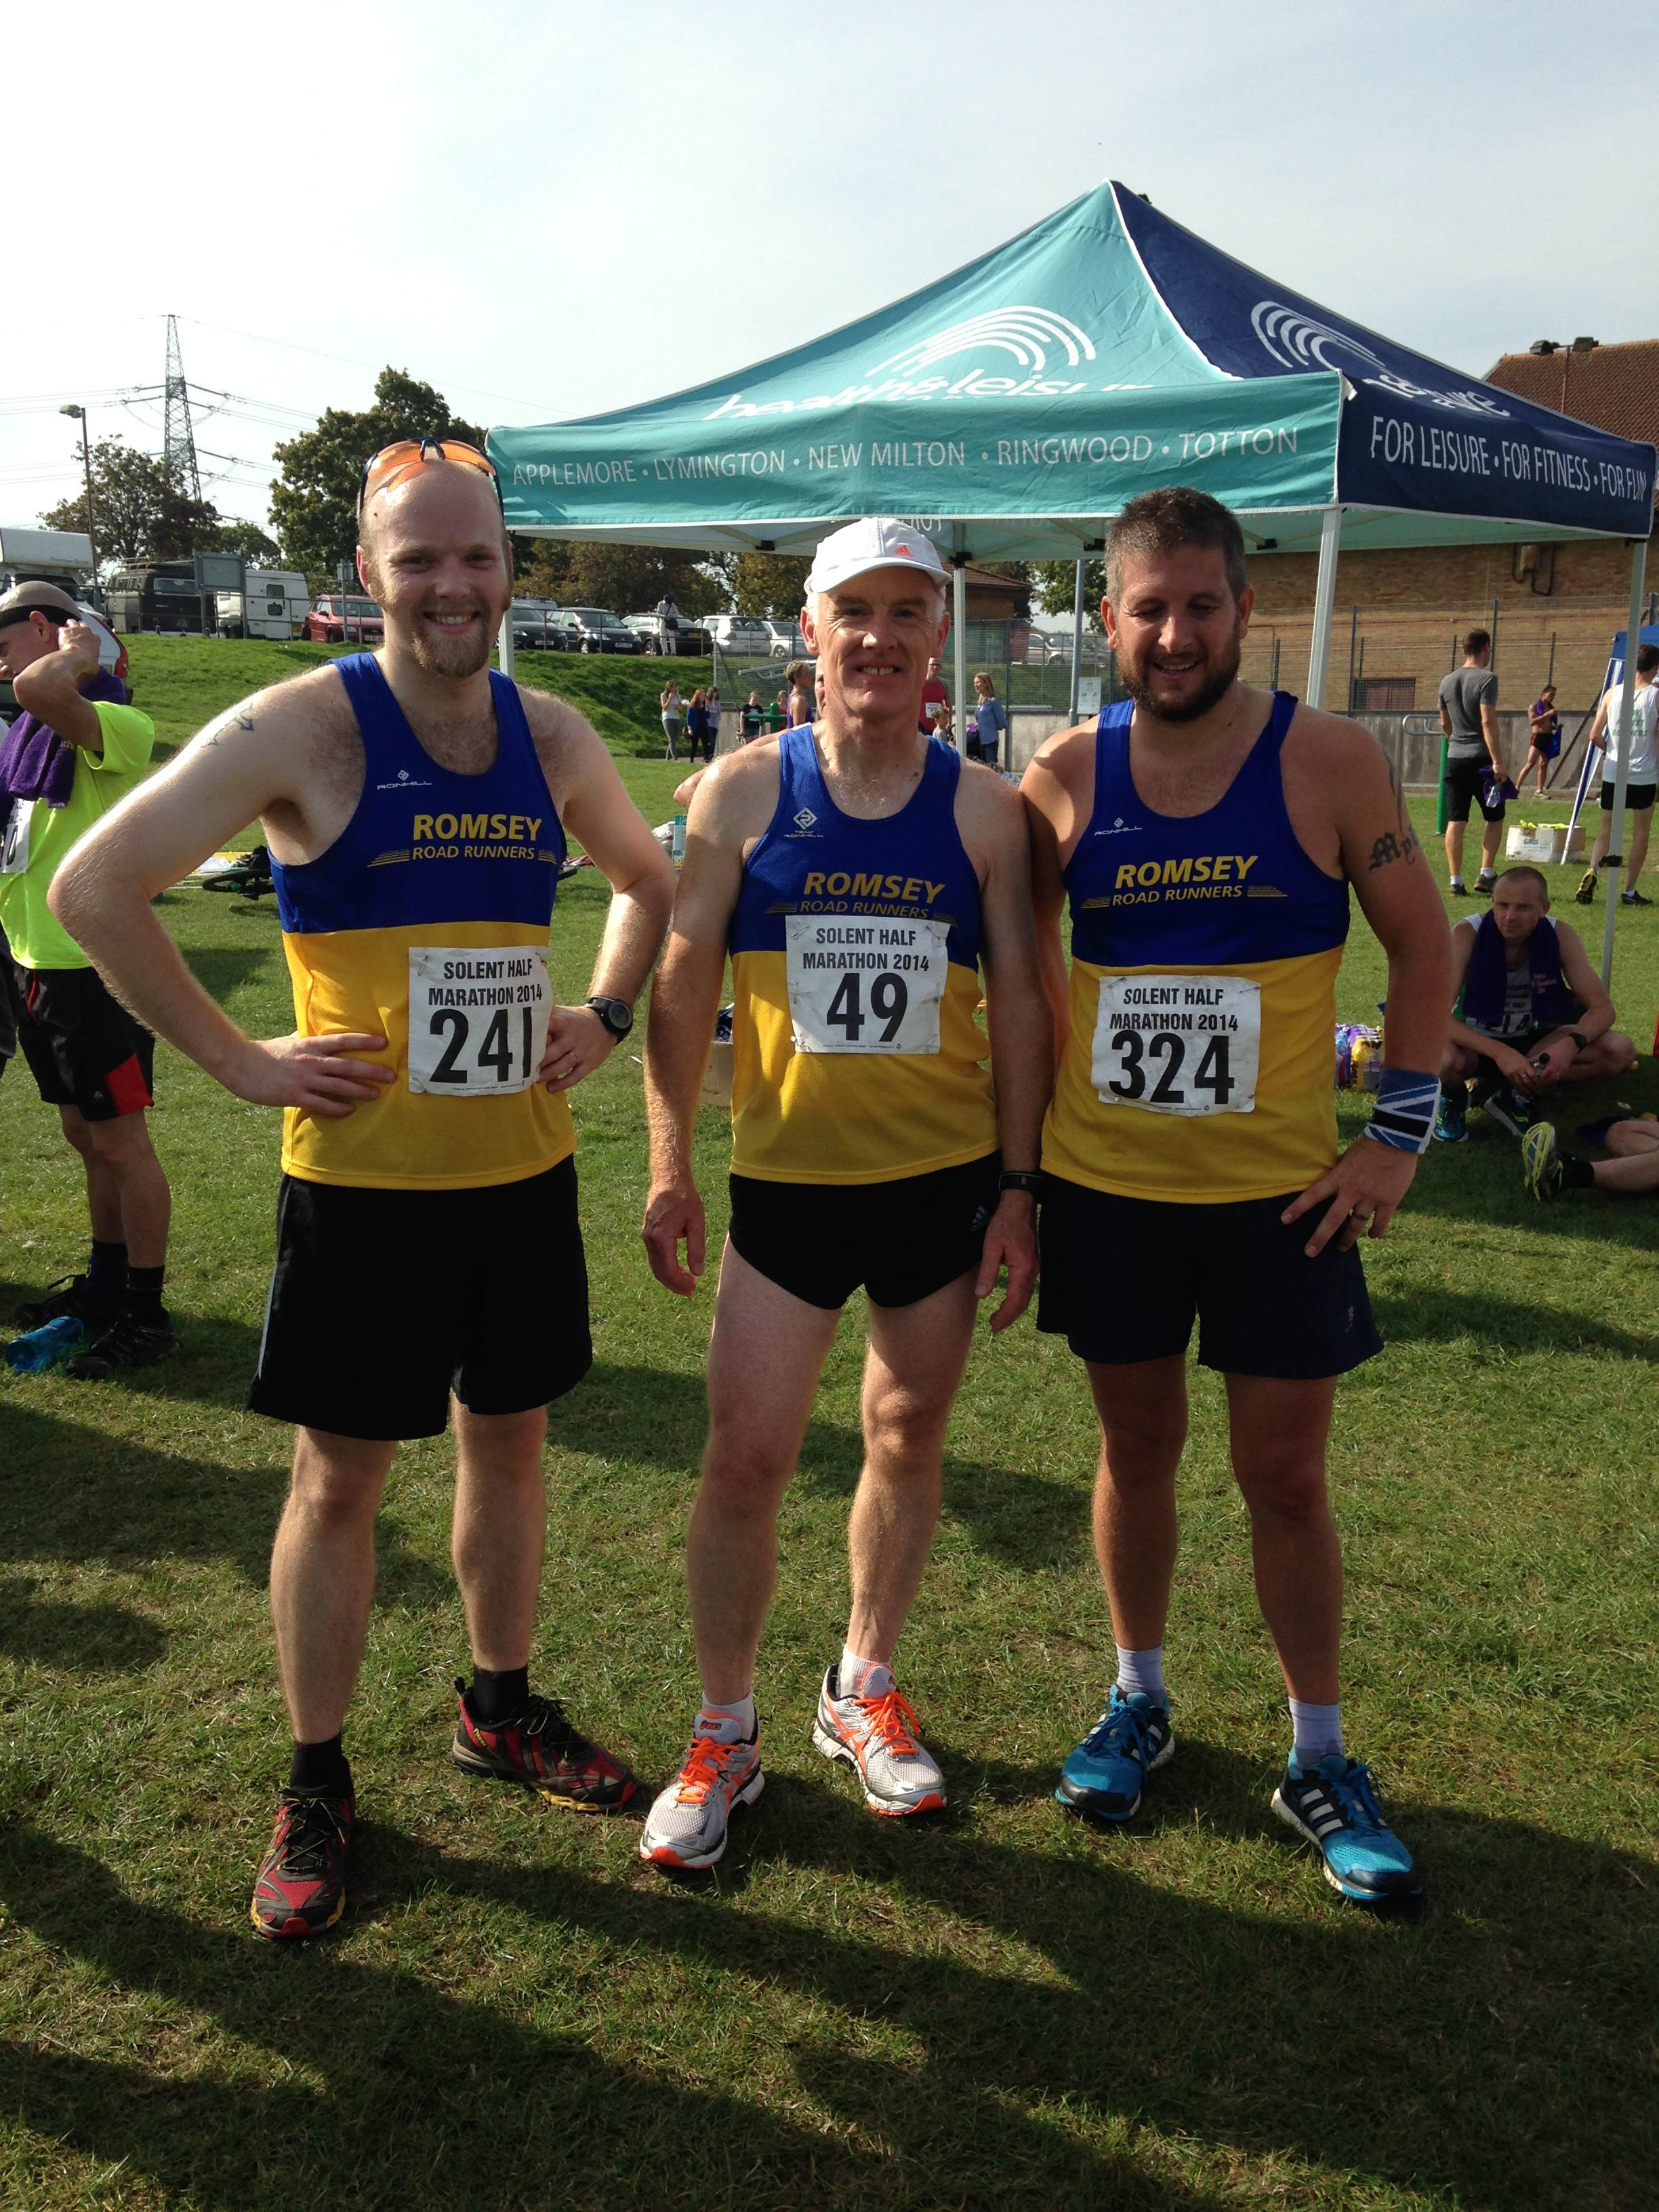 Solent Half Marathon 2014